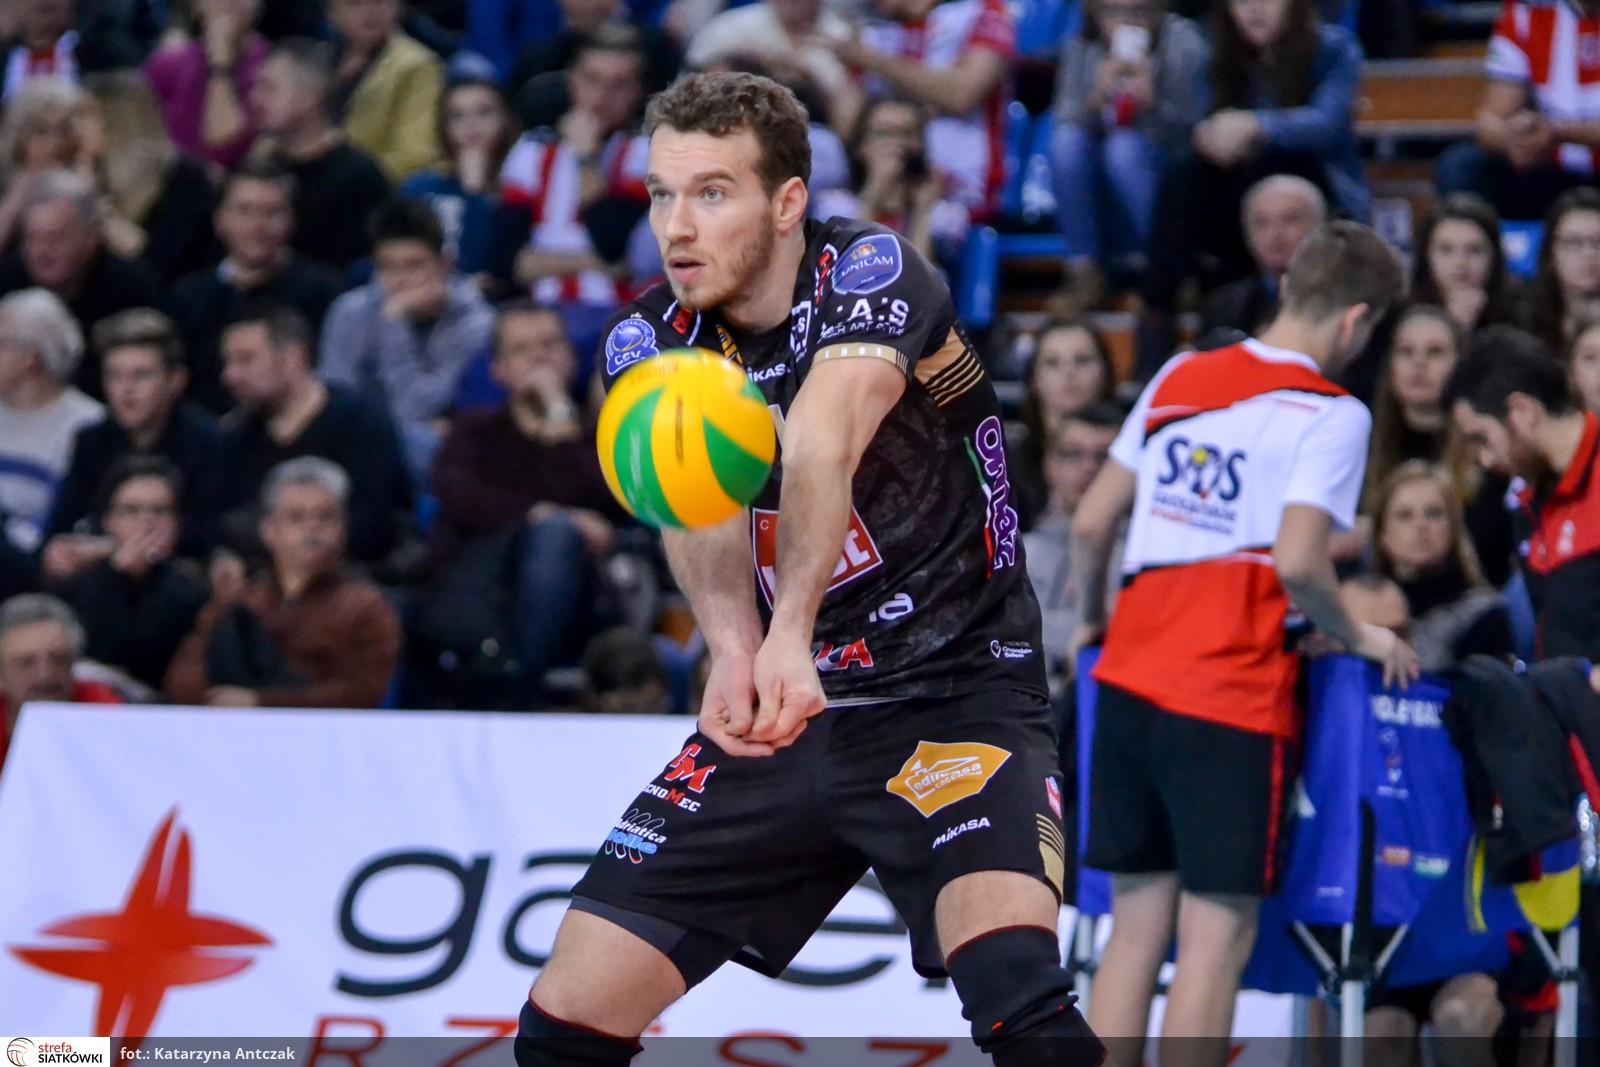 Modena volley rassegna stampa denis kaliberda l 39 ultimo for Casa modena volley